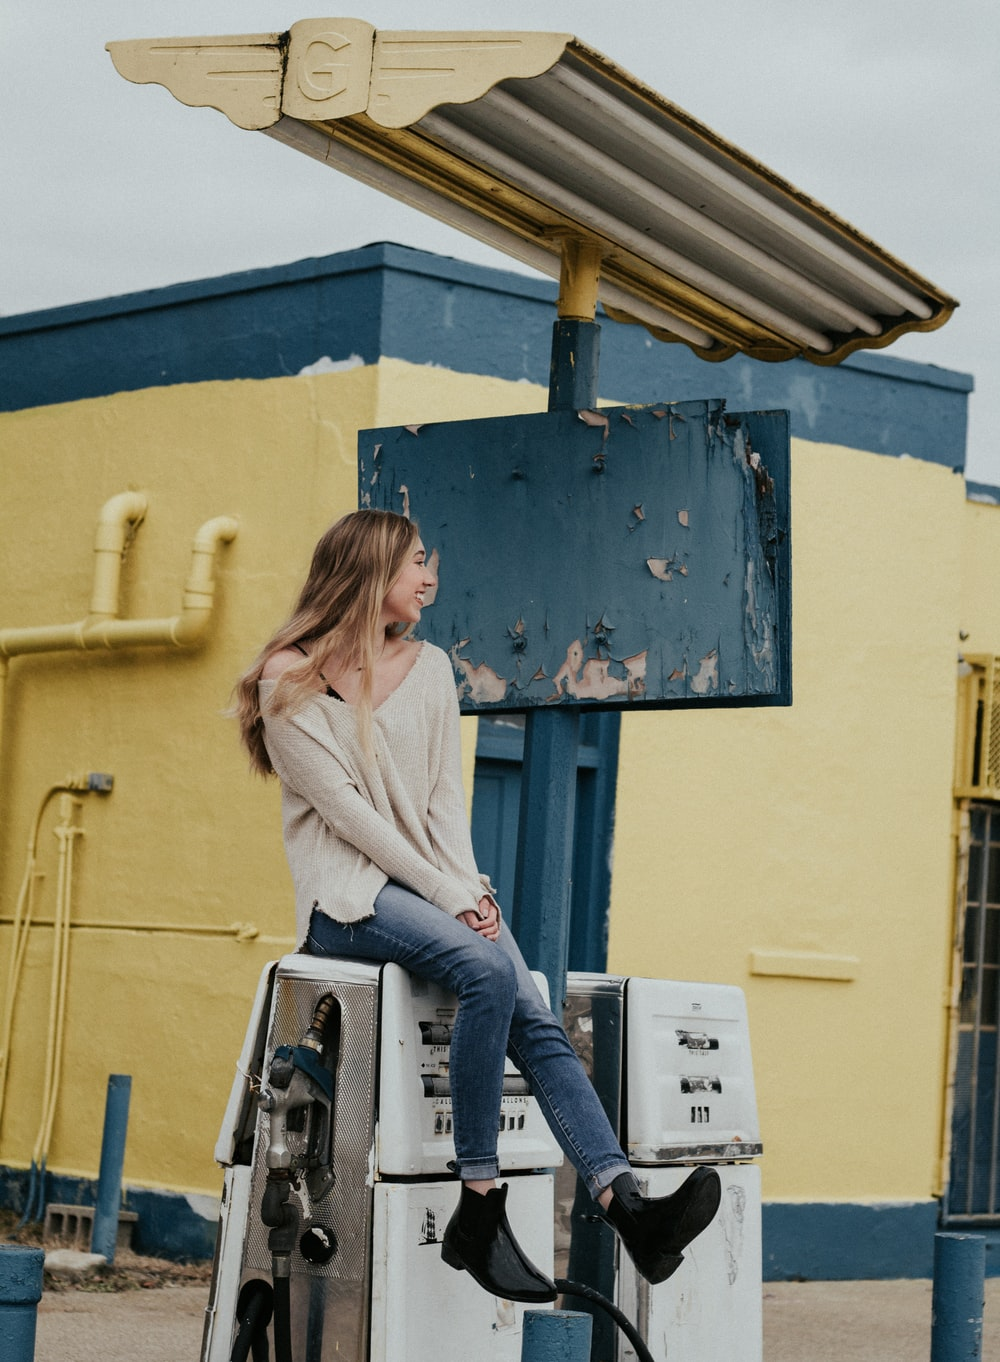 woman sitting on white gasoline pump machine during daytime